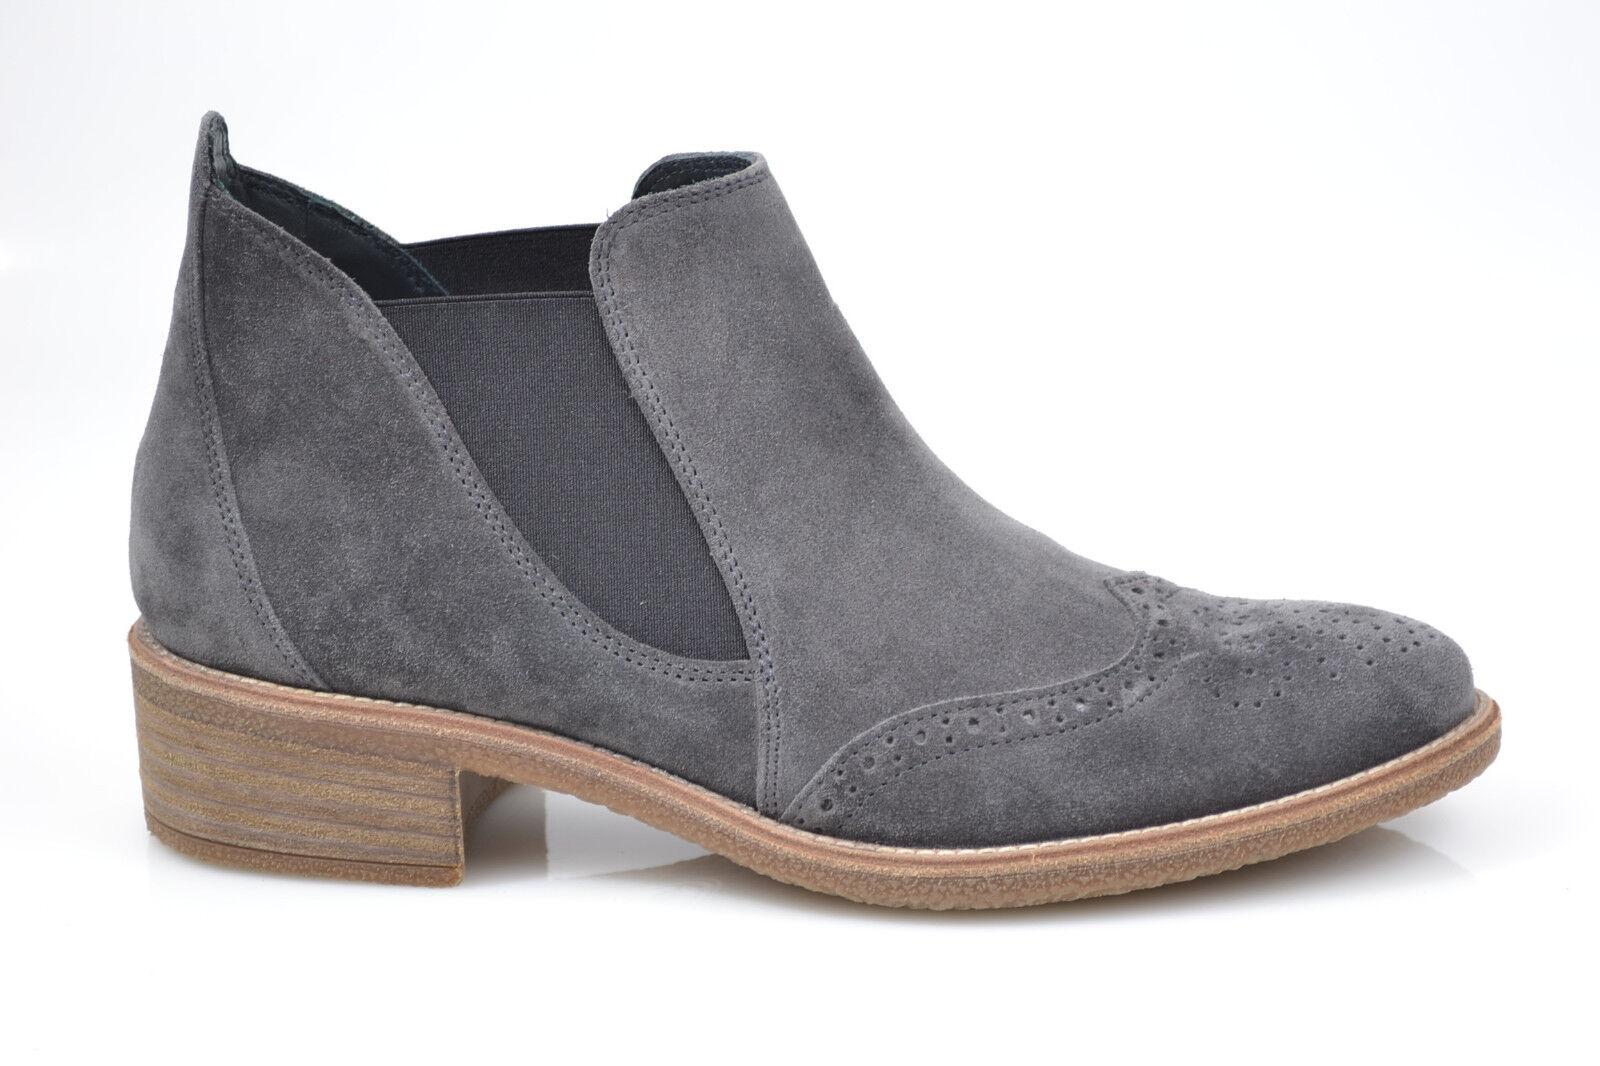 Paul Grün Damen Stiefelette Chelsea Stiefel NEU Suede Earth grau Leder NEU Stiefel 71872b